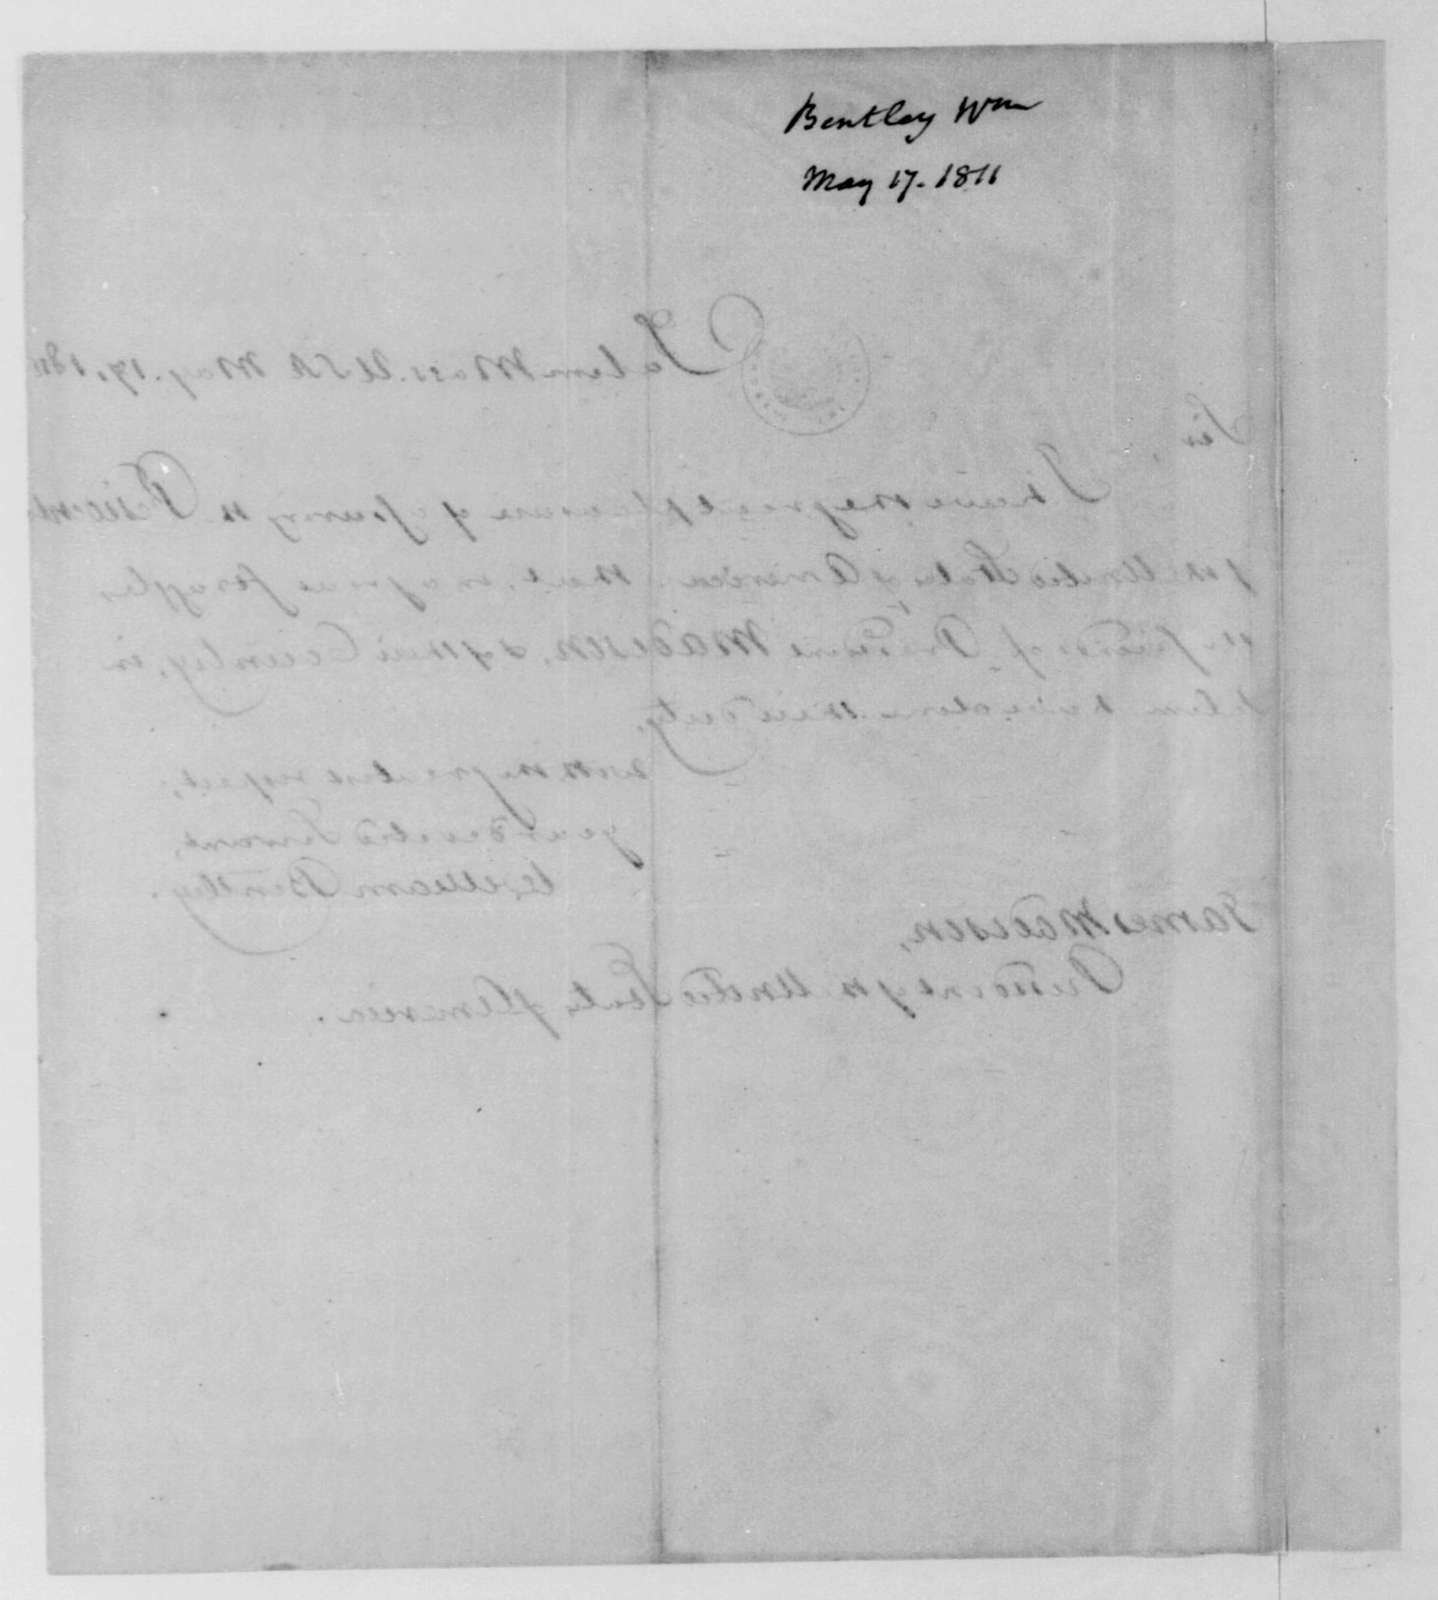 William Bentley to James Madison, May 17, 1811.